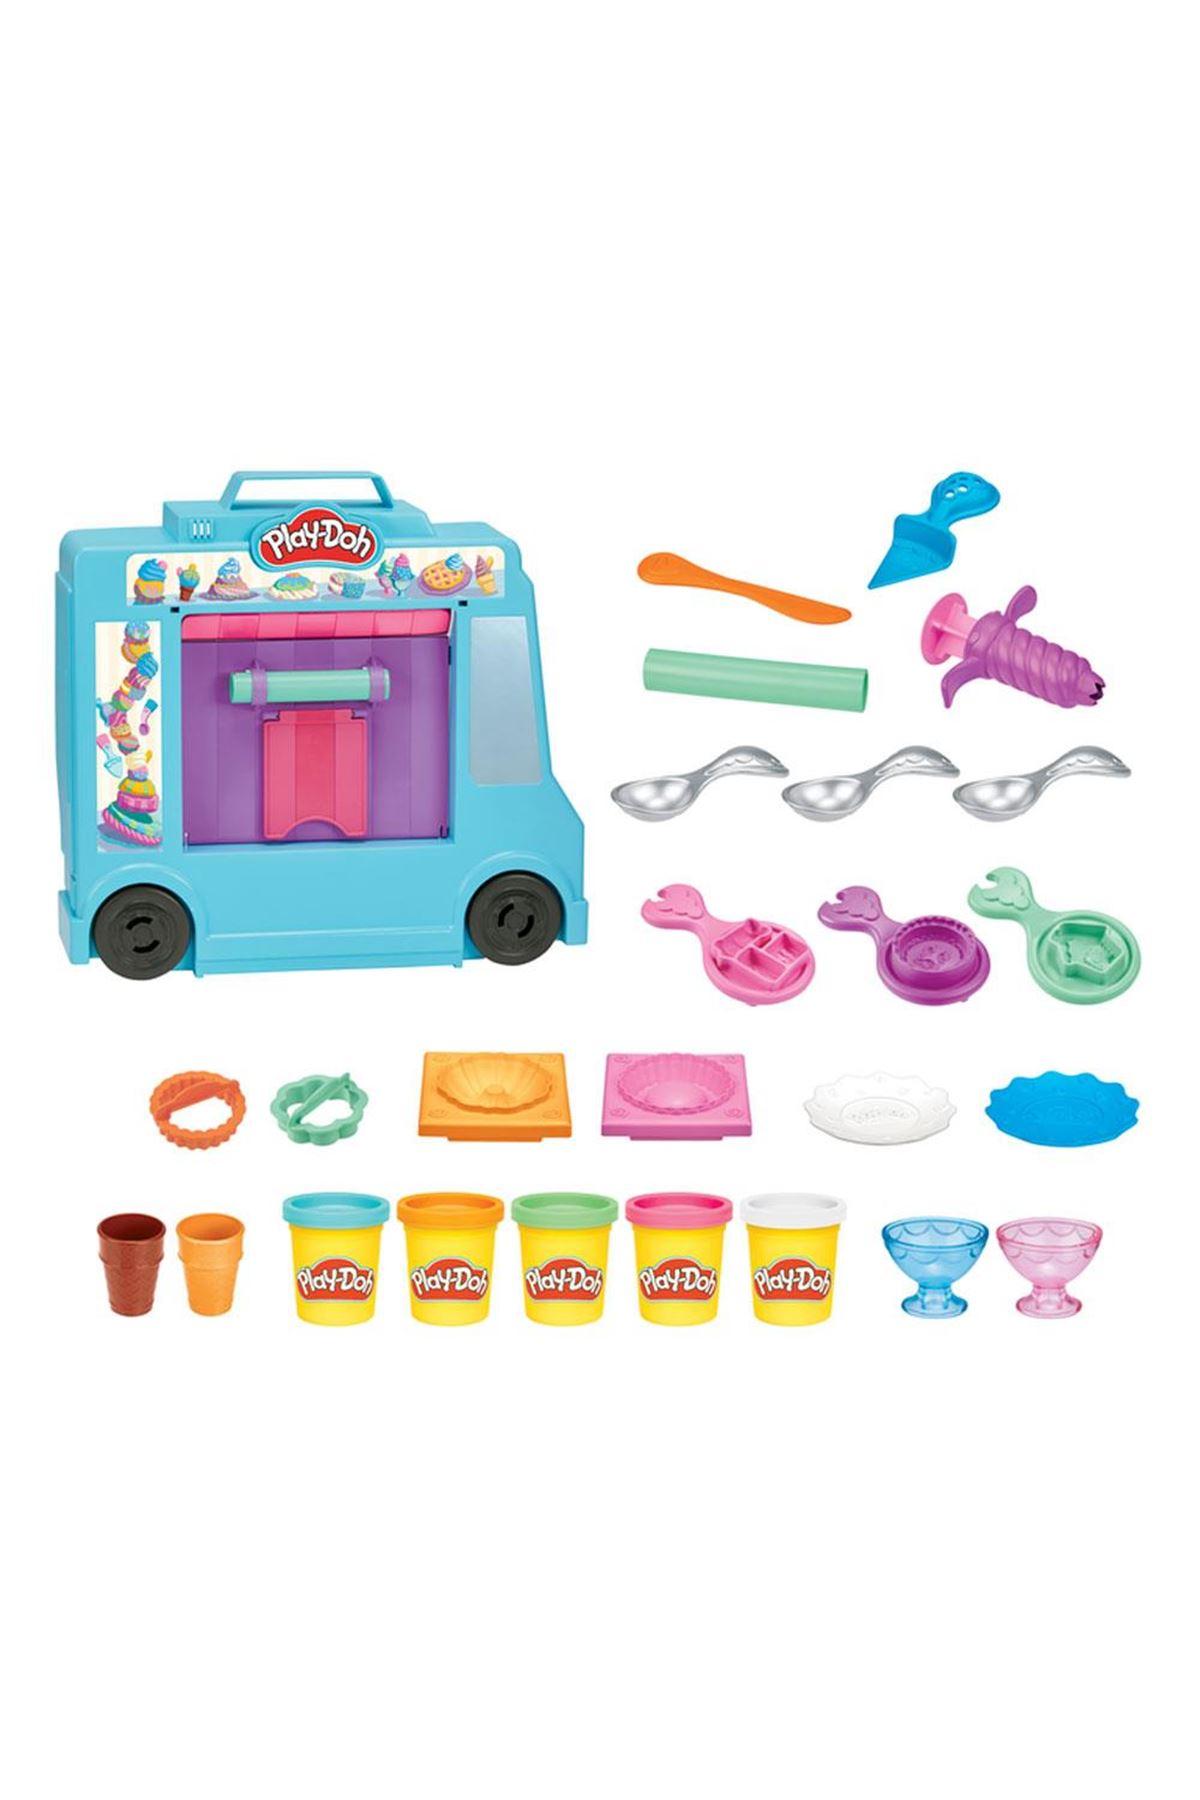 Play-Doh İce Cream Truck Play Set F1390